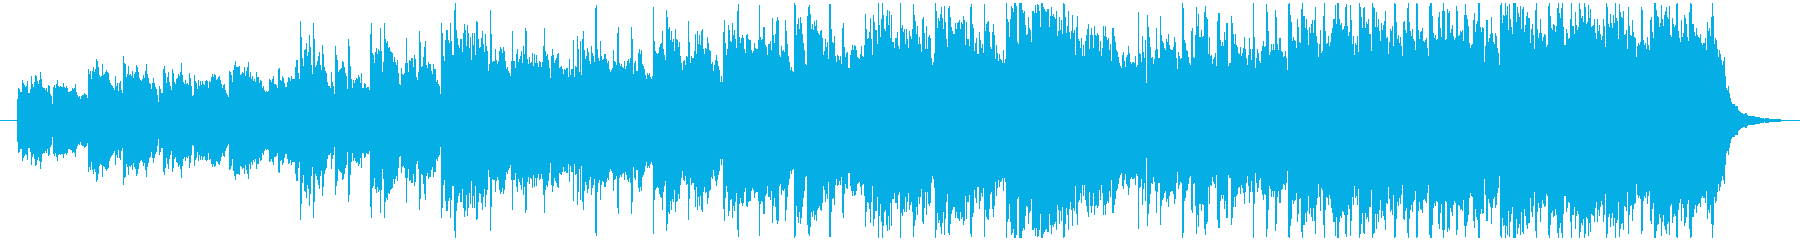 Waves Of Insp. Shortの再生済みの波形